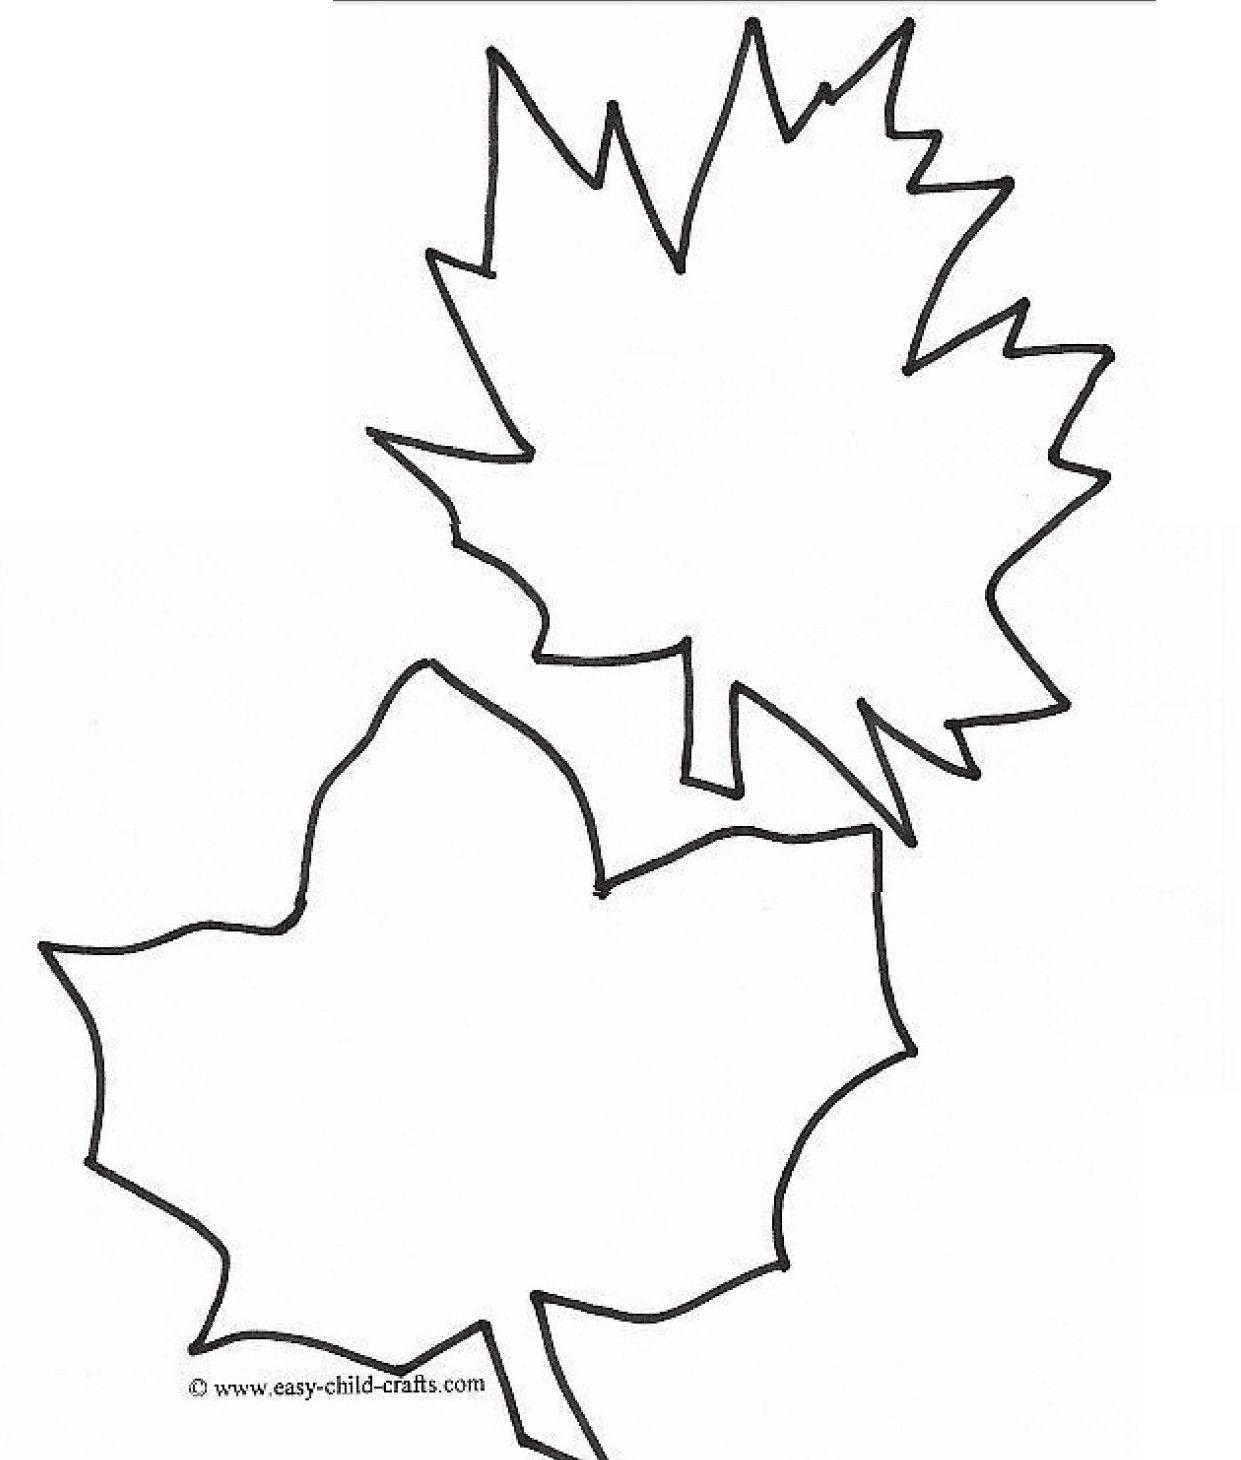 Cool 1 2 3 Nu Kapitel Resume Small 1.5 Binder Spine Template Regular 1st Job Resume Template 2 Column Css Template Old 2 Page Brochure Template Fresh2 Page Resume Template Download Traceable Leaf Patterns   Coloring Home